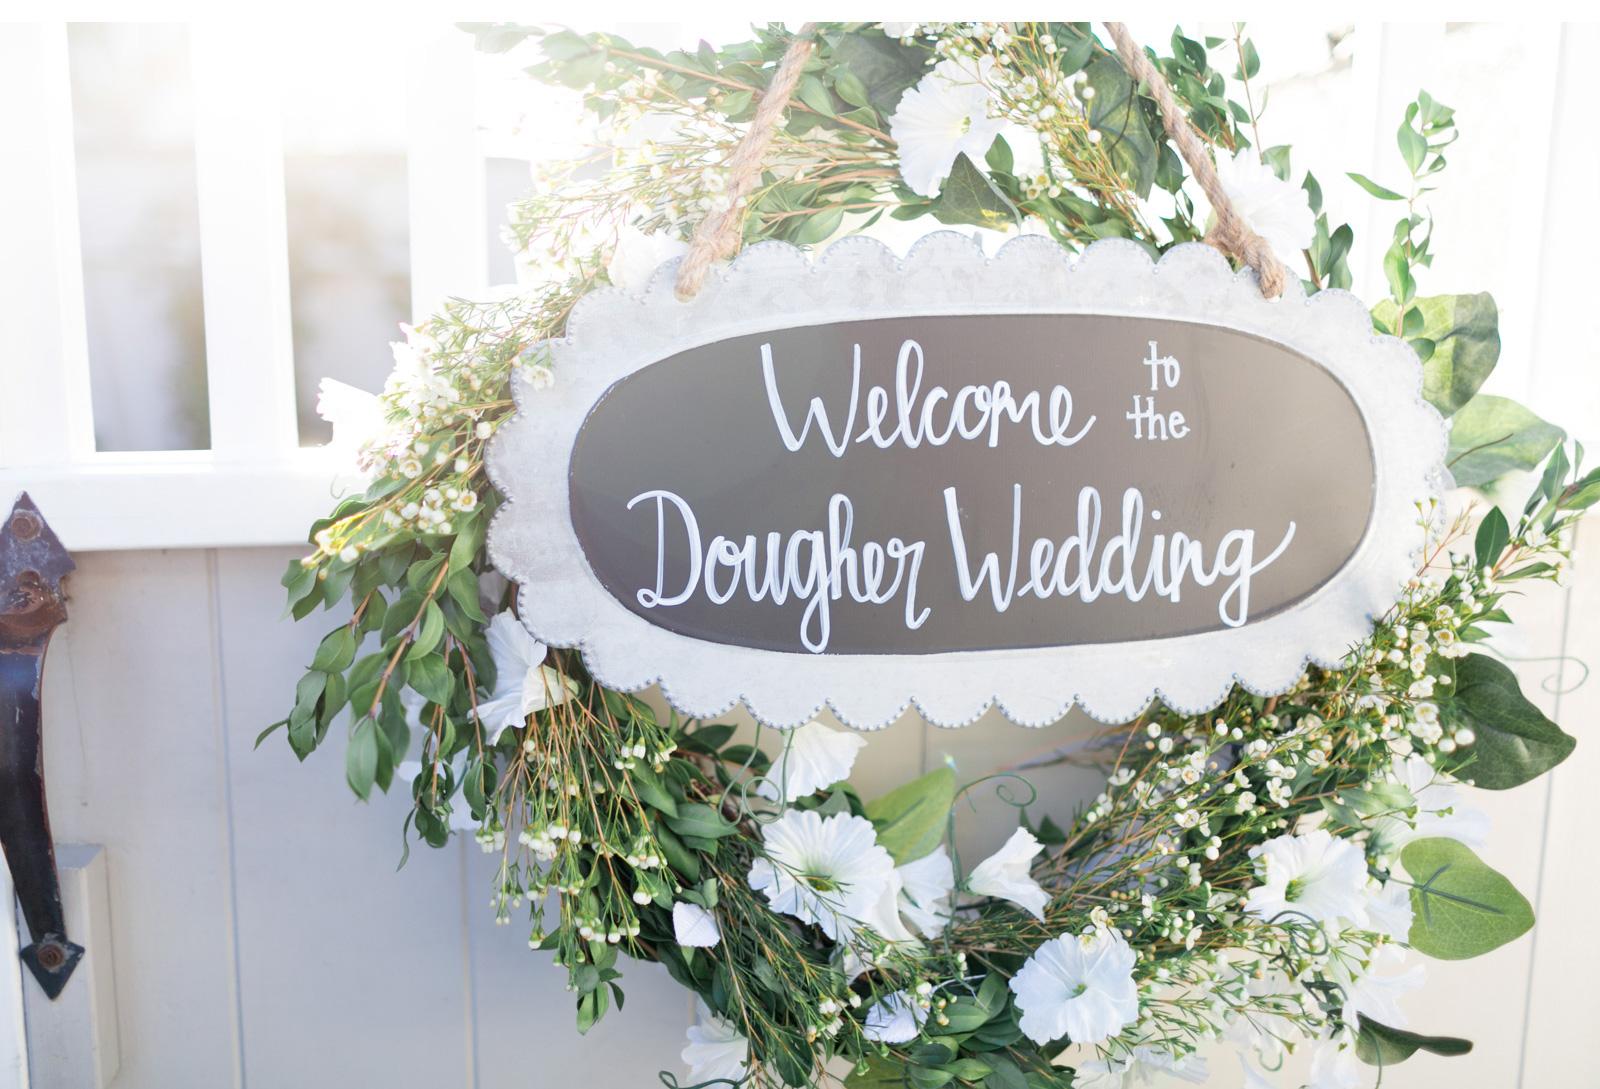 Jon-&-Amanda-Dougher's-Backyard-Wedding-Natalie-Schutt-Photography_01.jpg